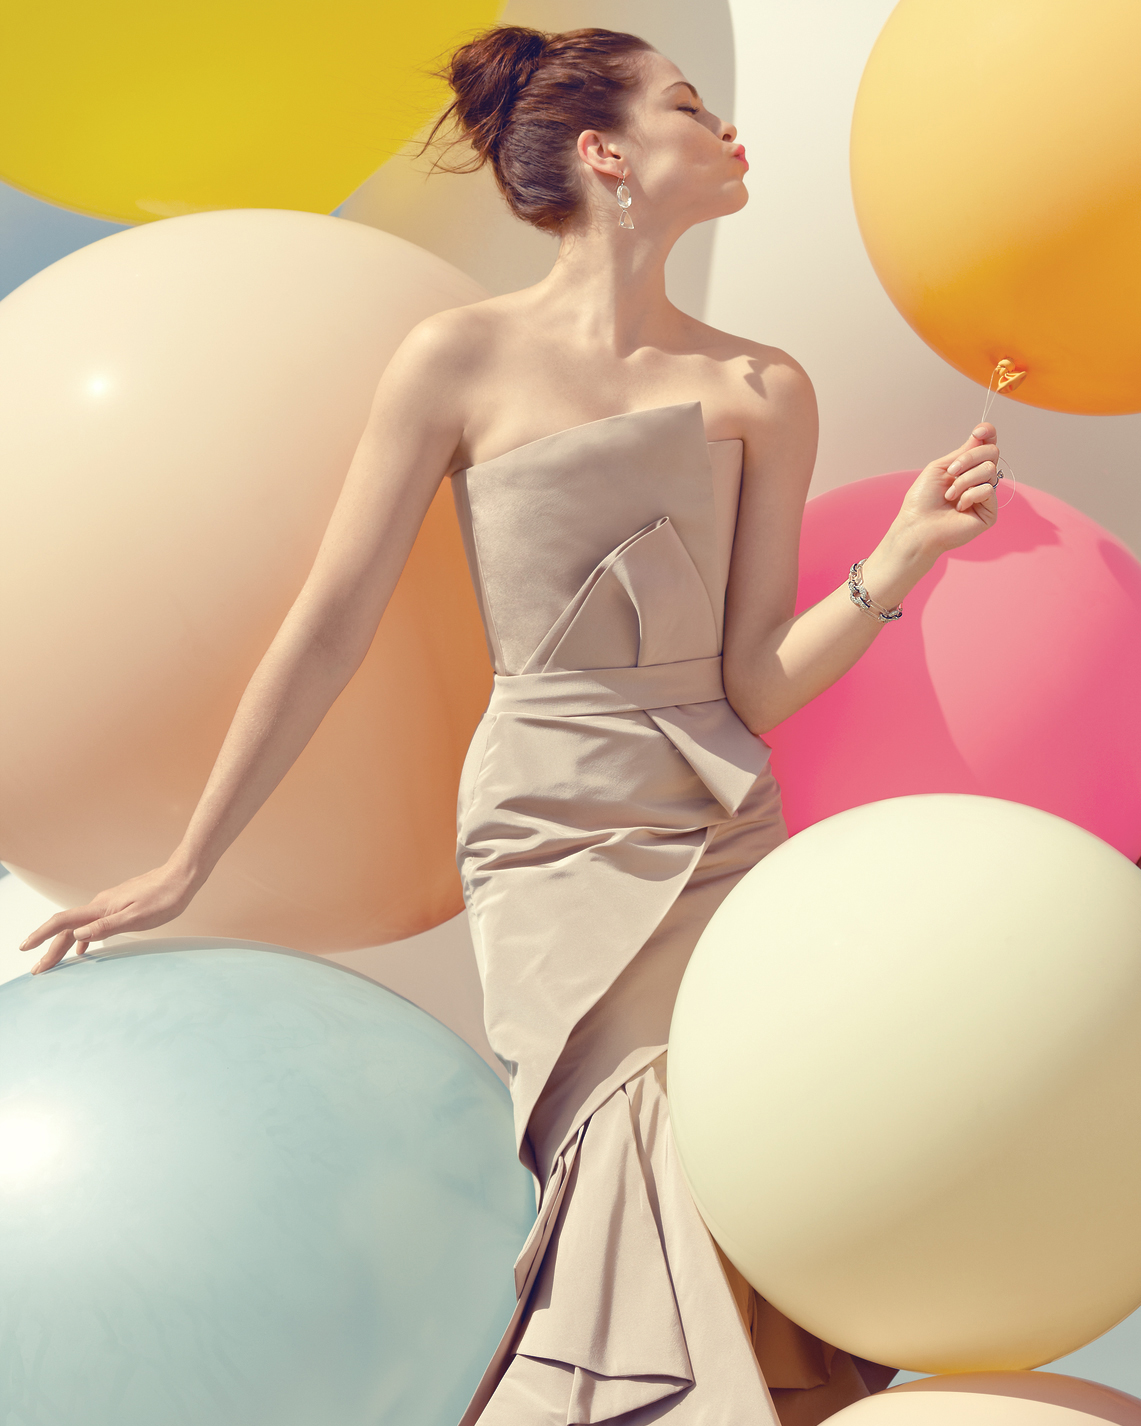 wedding-dress-9-mwd108453.jpg